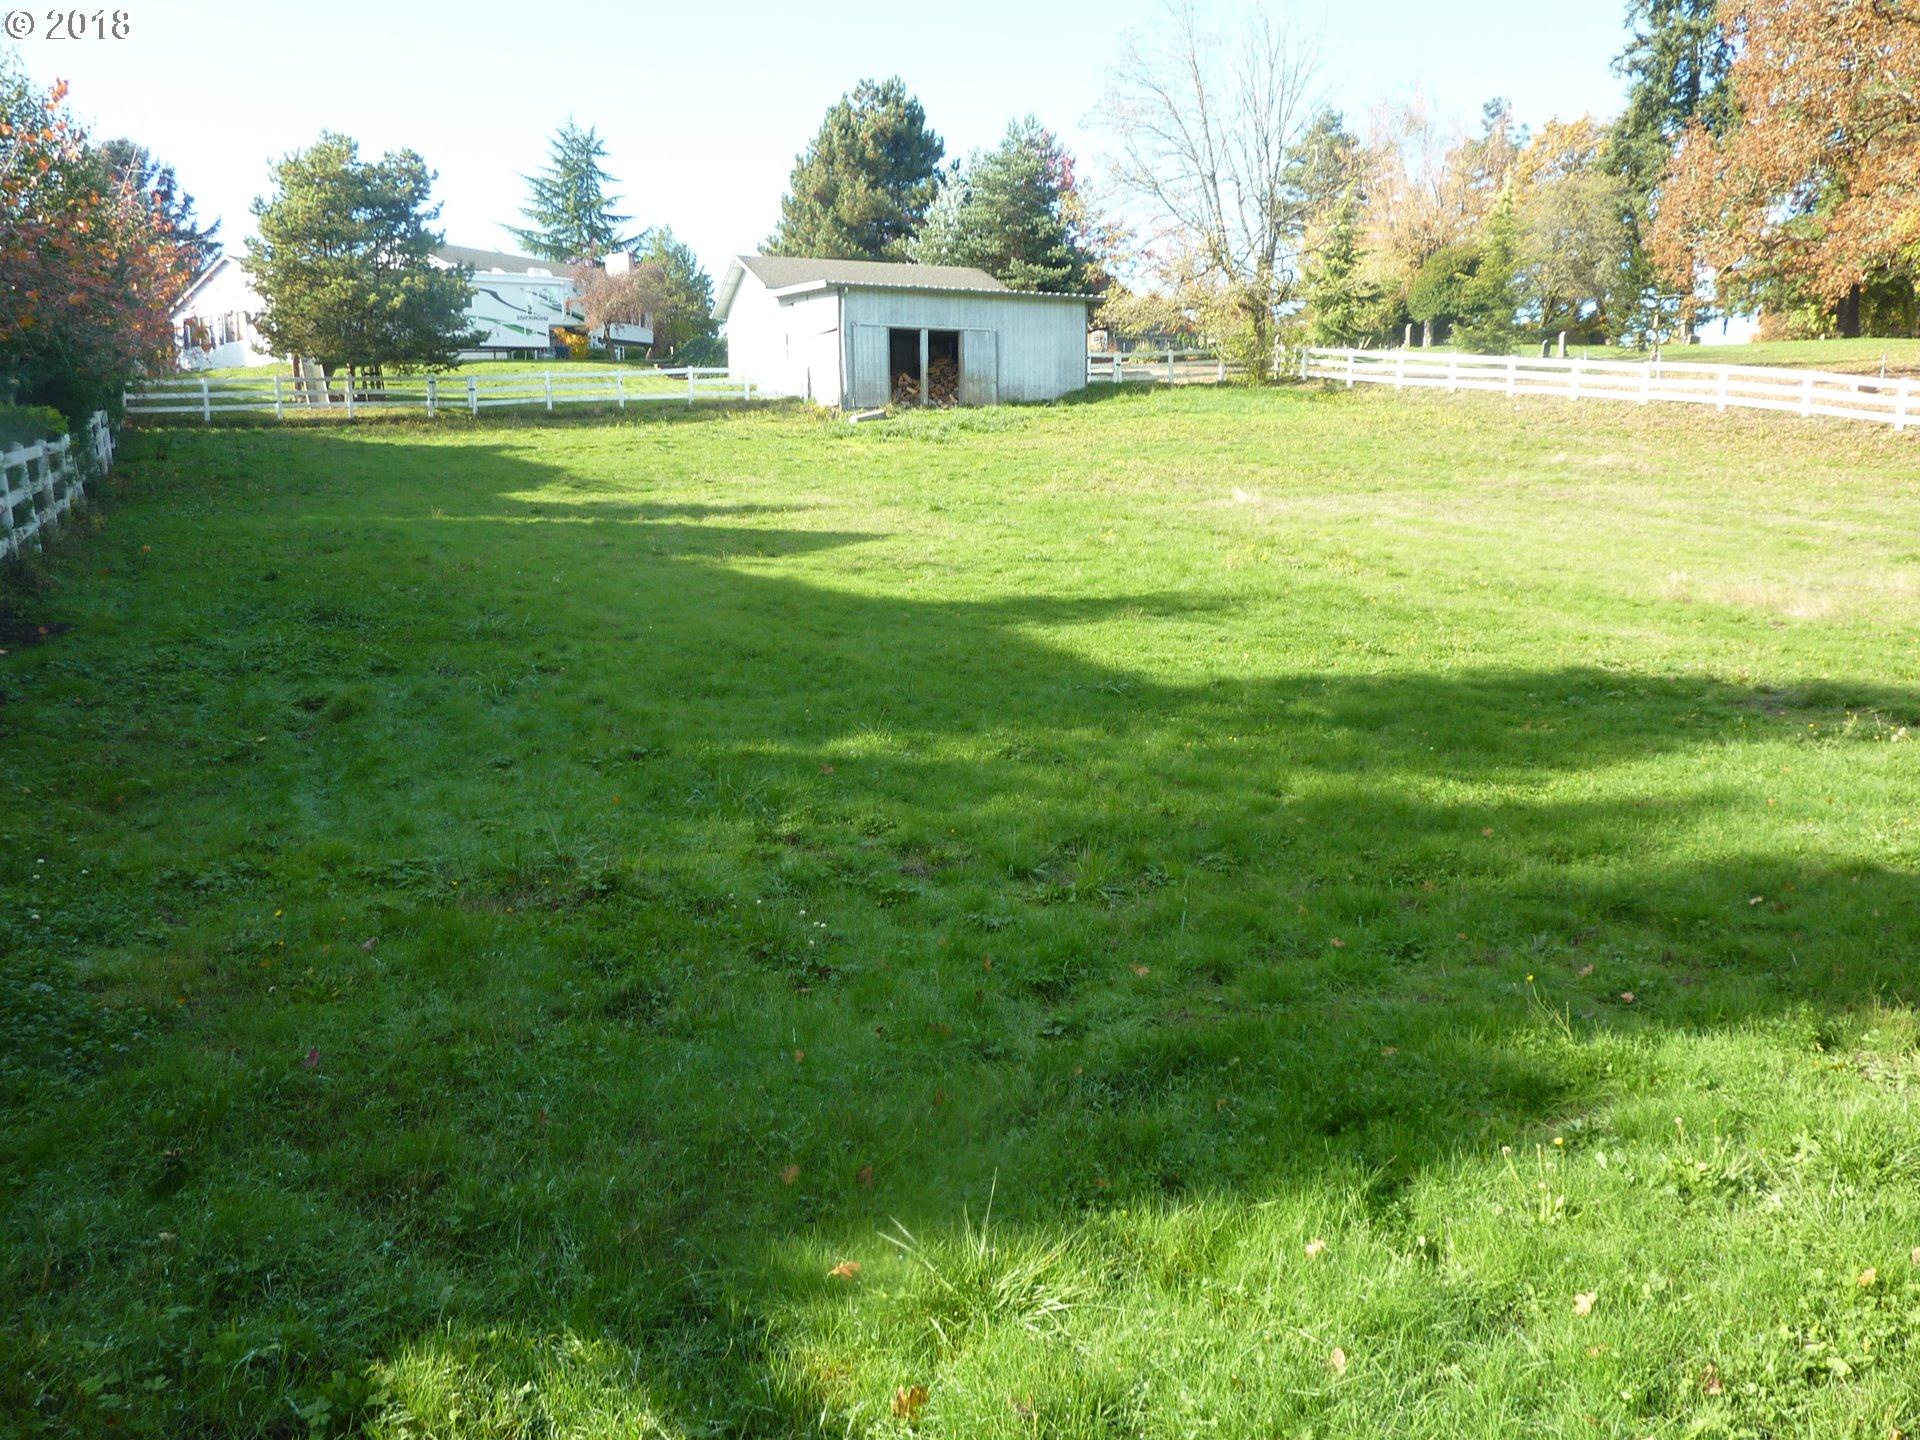 955  Cemetery Rd, Ridgefield, WA 98642